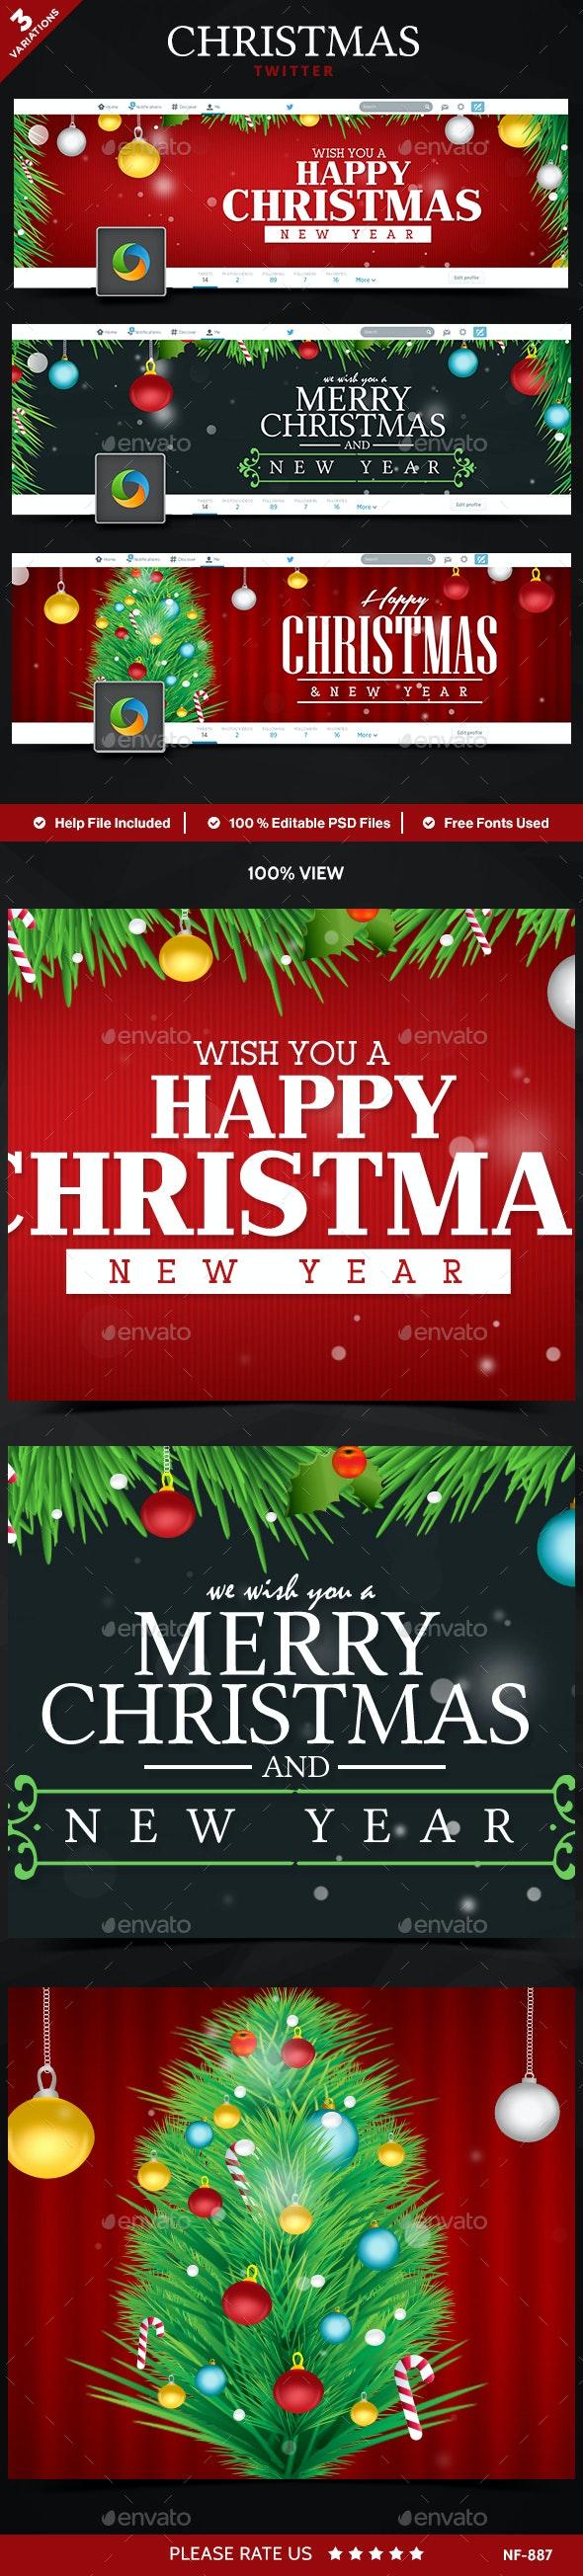 Christmas Twitter Headers - 3 Designs - Twitter Social Media